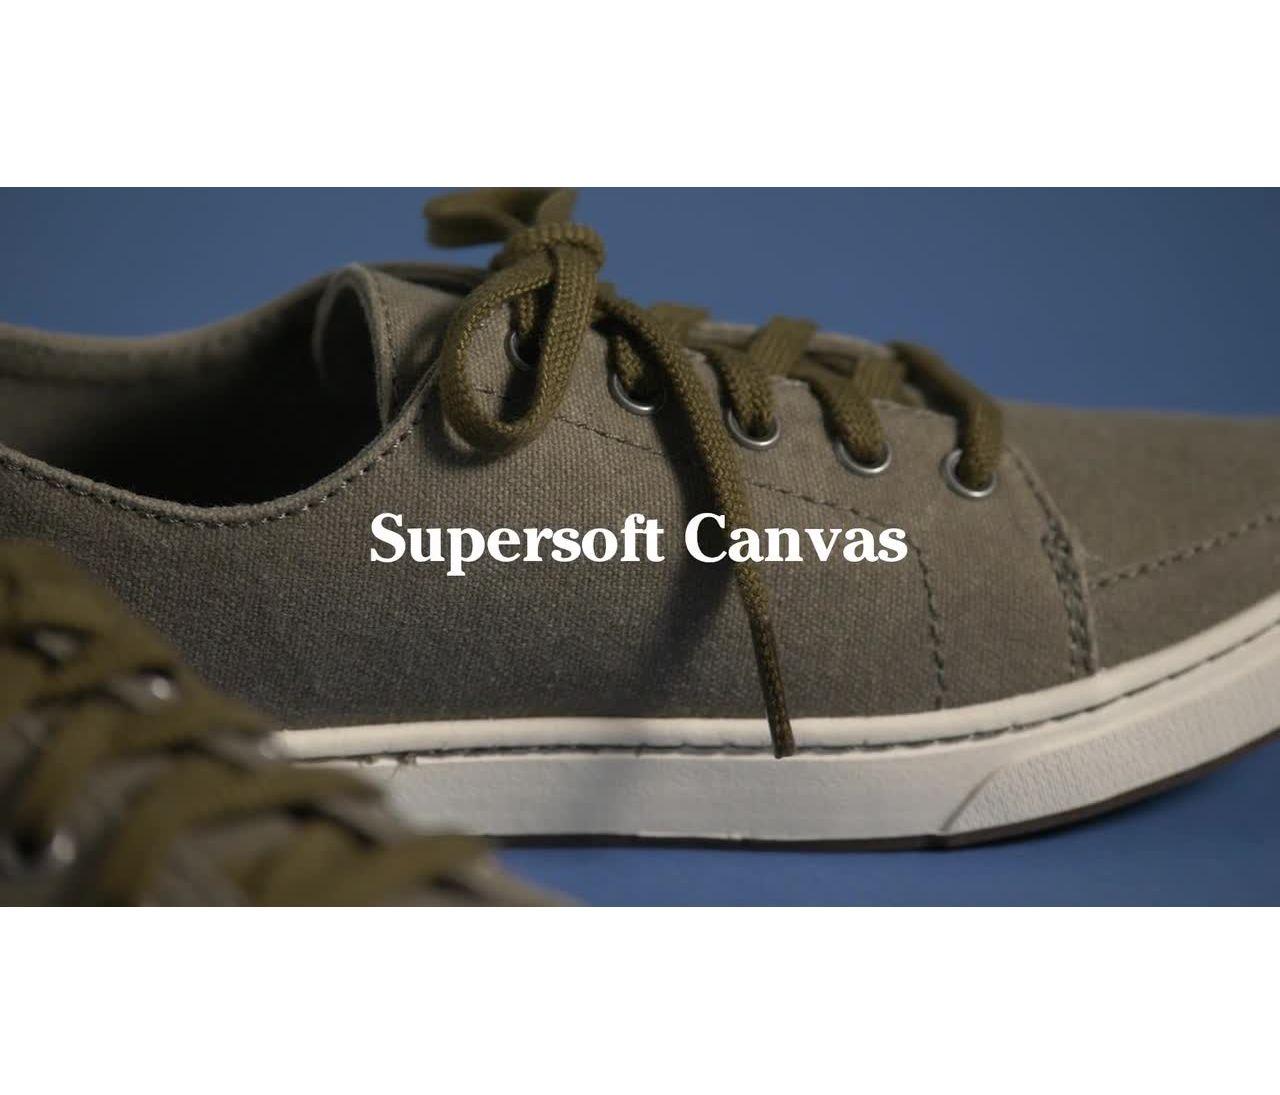 Video: Campside Shoe Oxford  LTT Canvas Ws